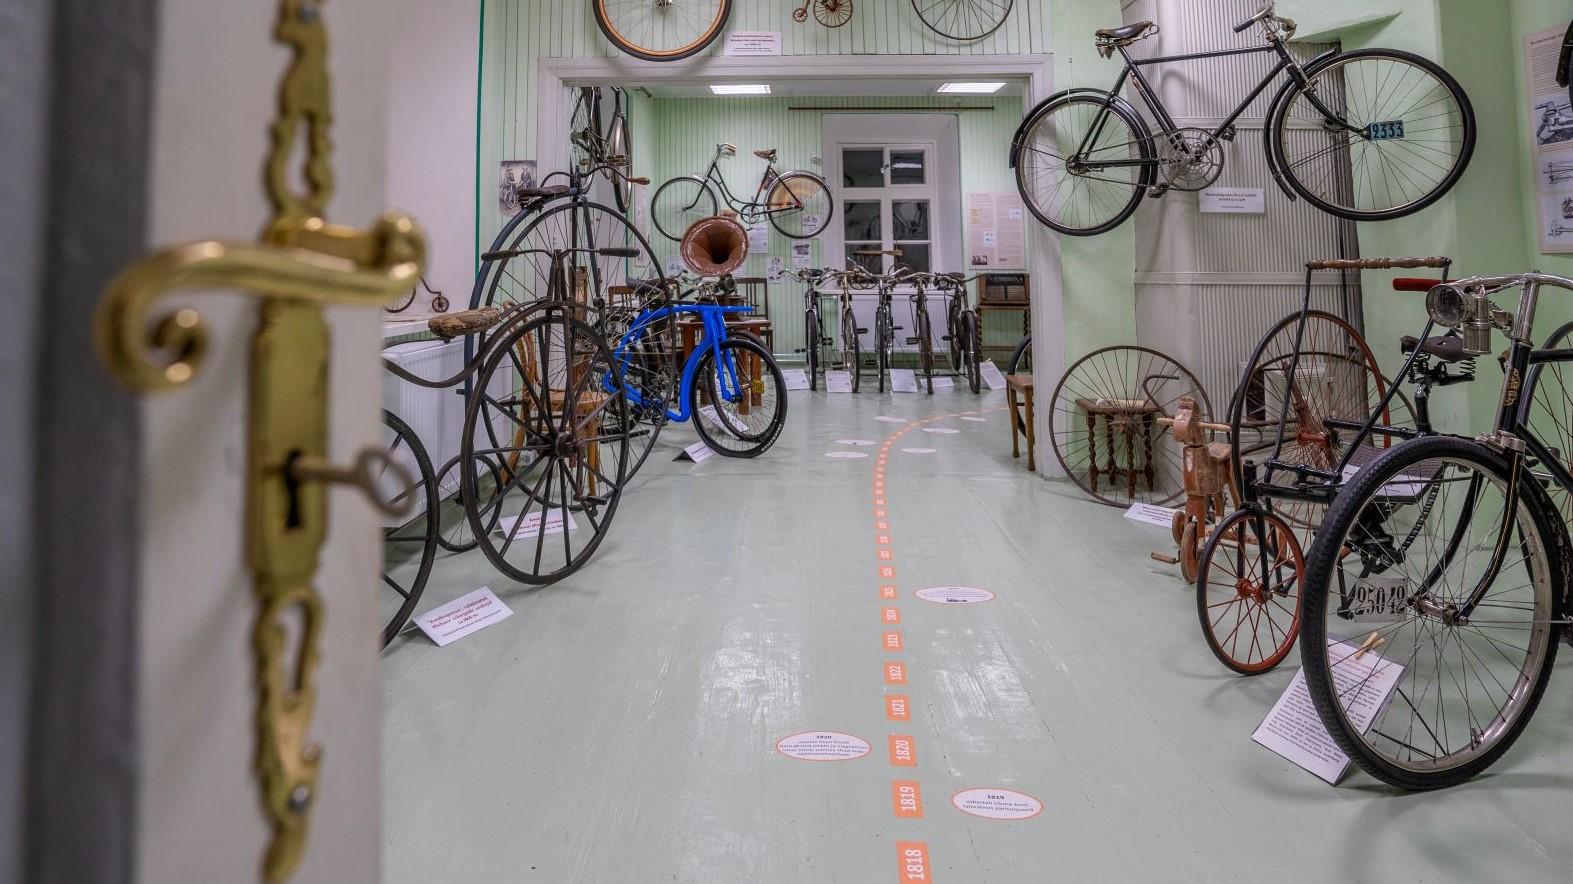 Eesti jalgrattamuuseum